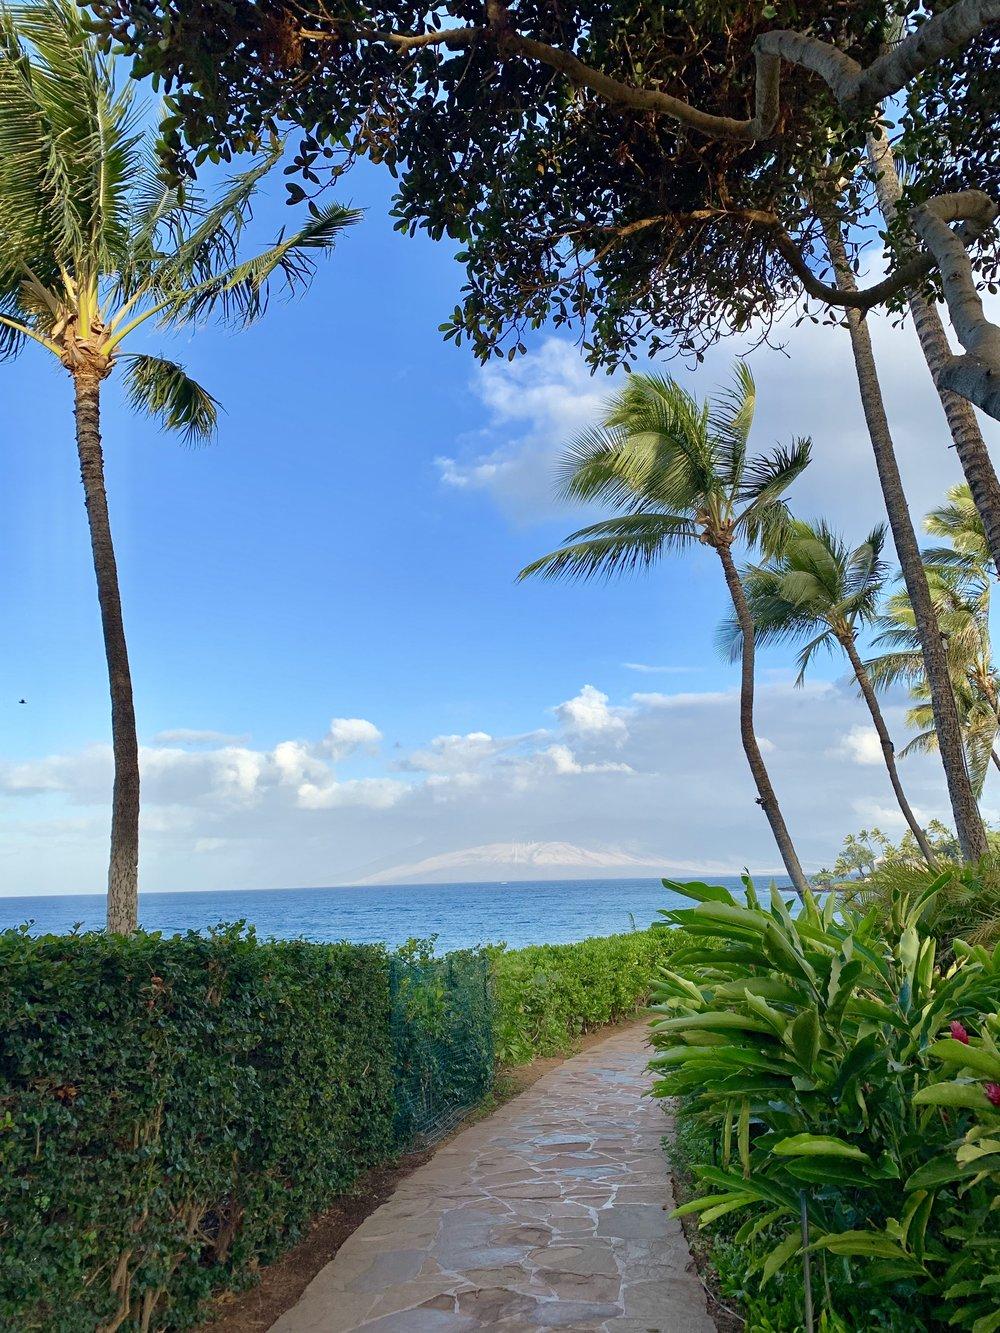 Pathway by Wailea Beach